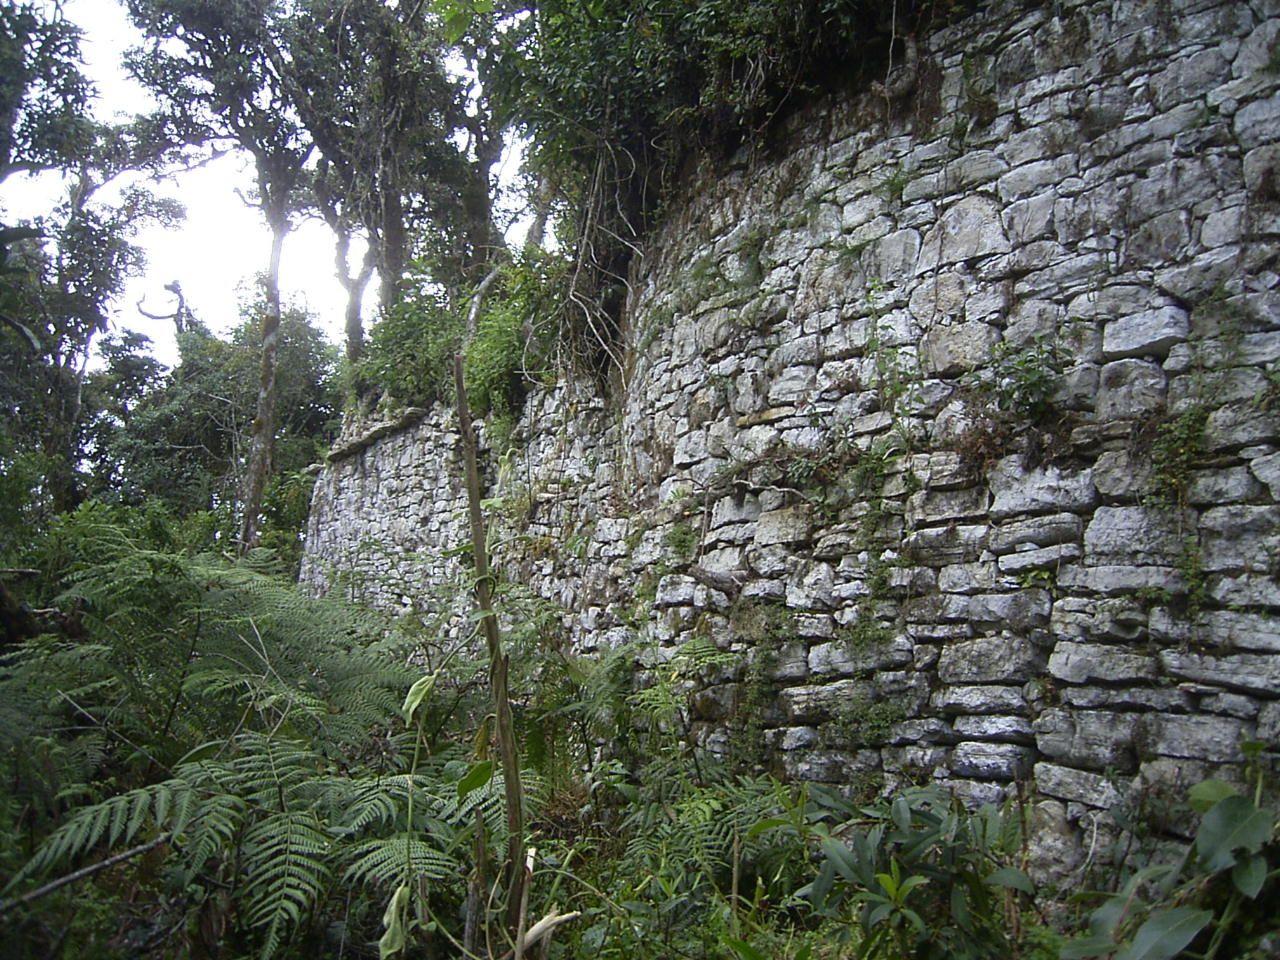 sito archeologico mummie